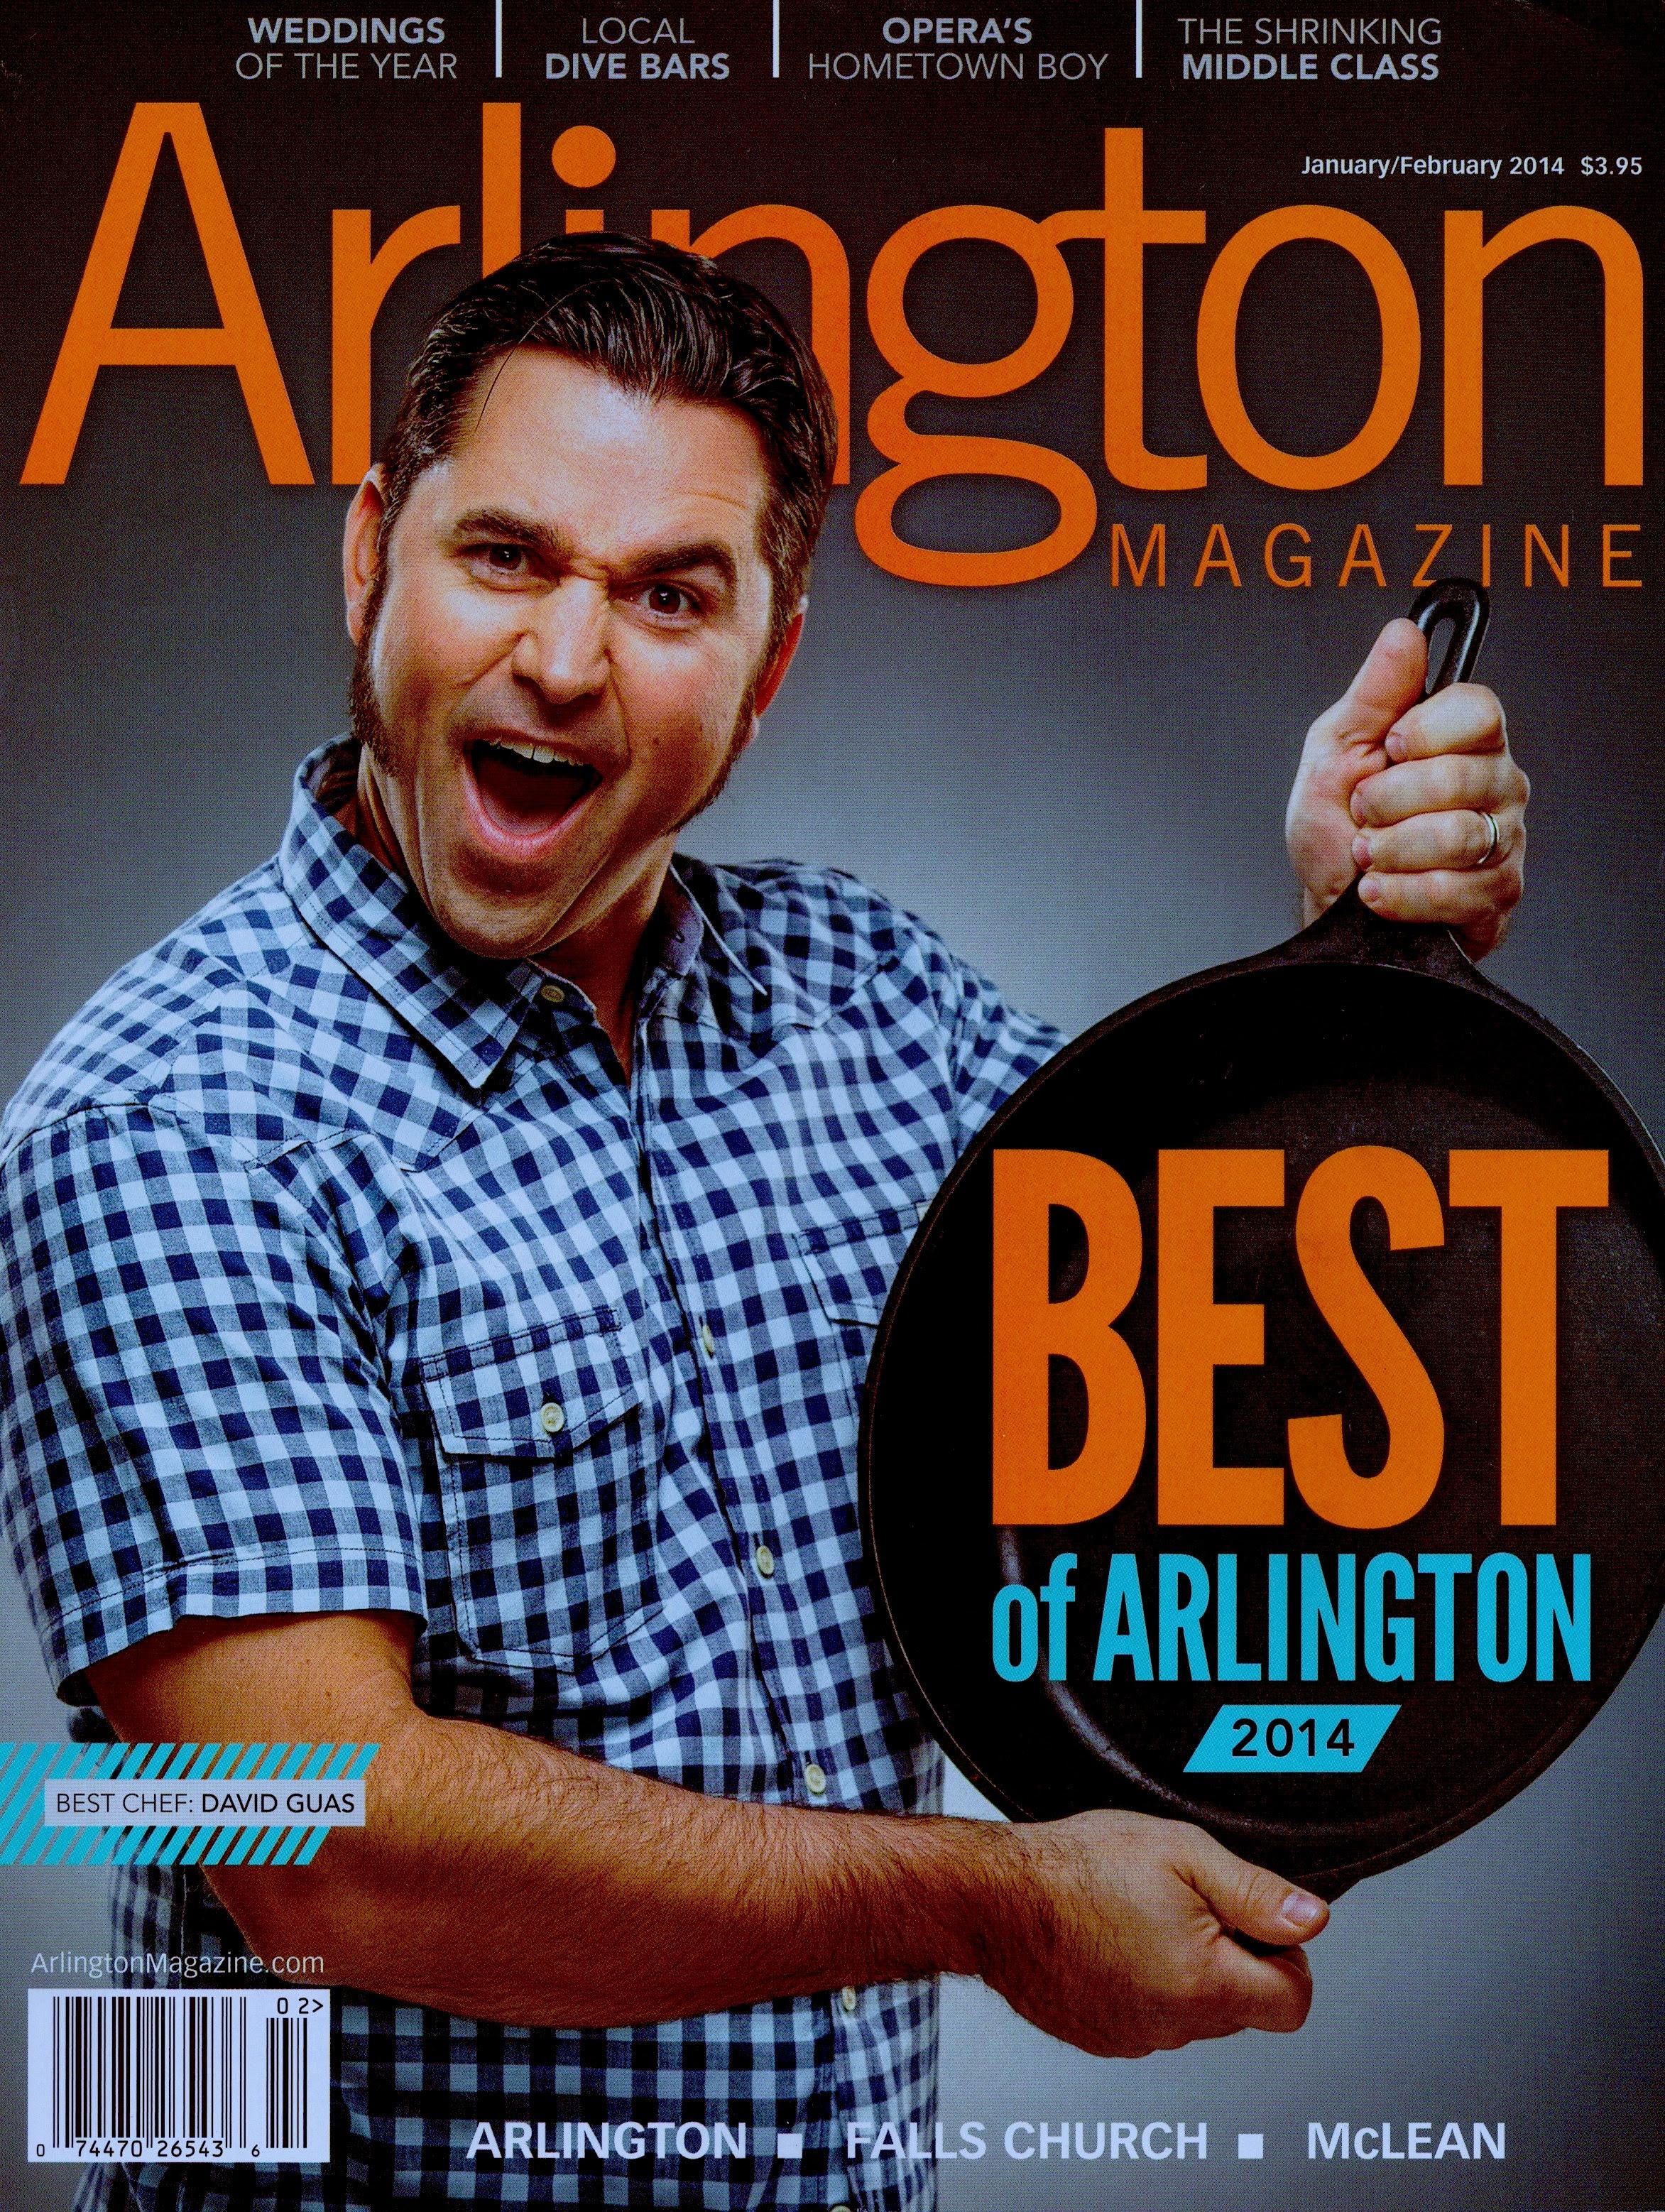 DavidGuas_Arlington Magazine.jpg